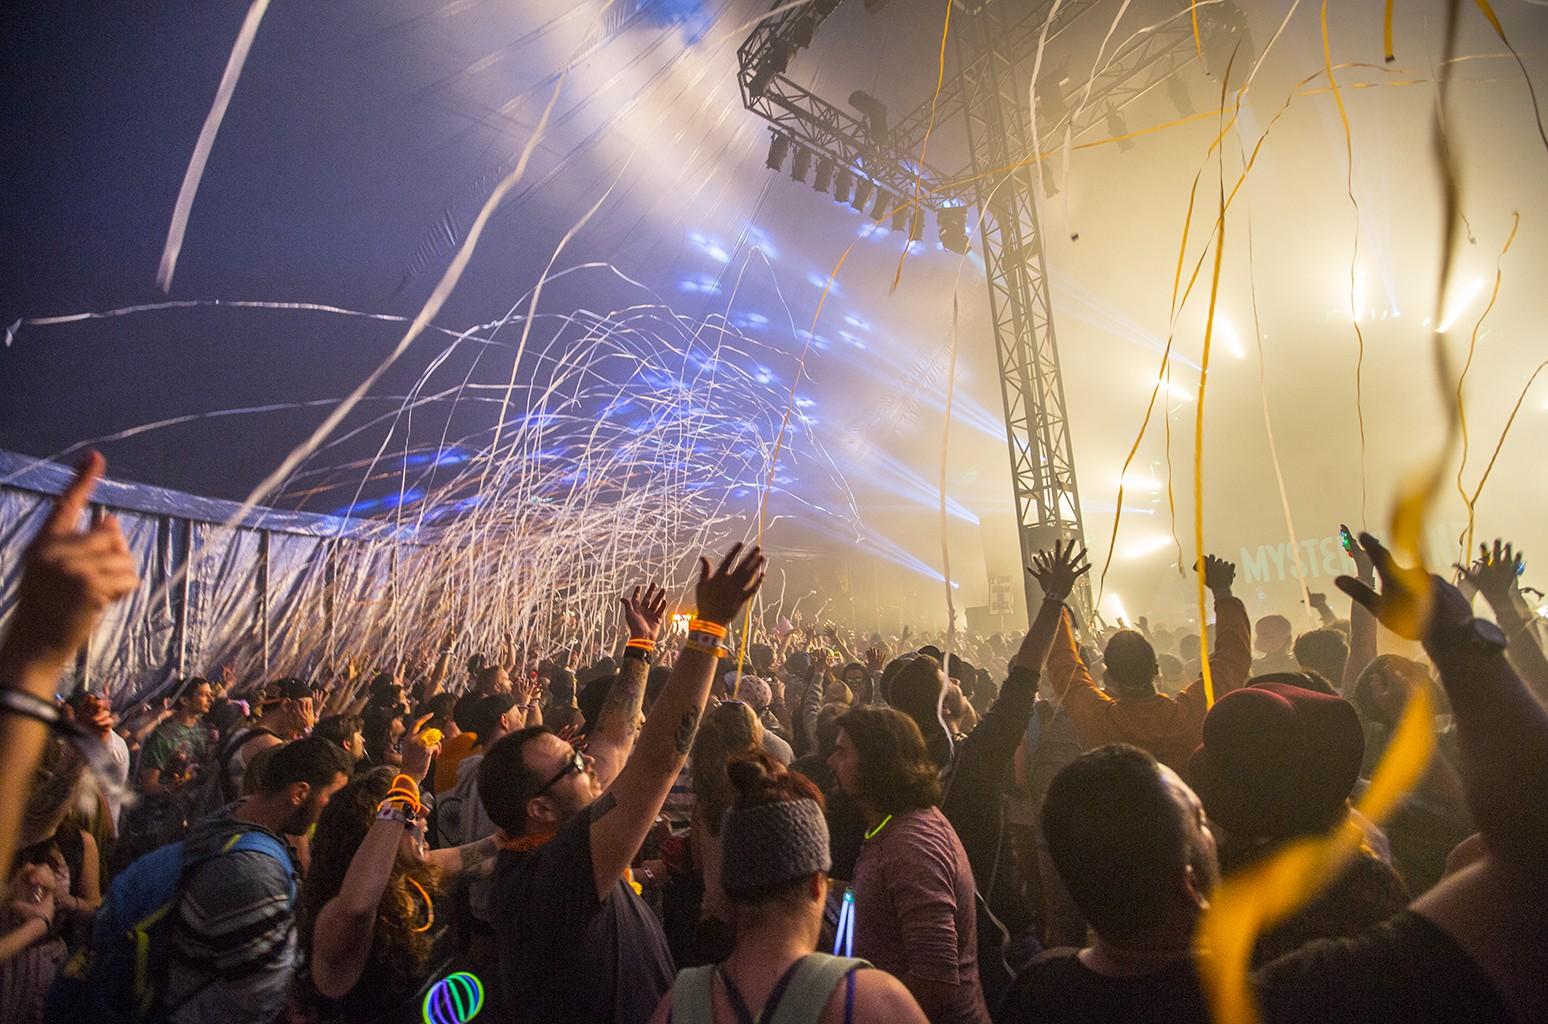 Atmosphere during Mysteryland 2015.